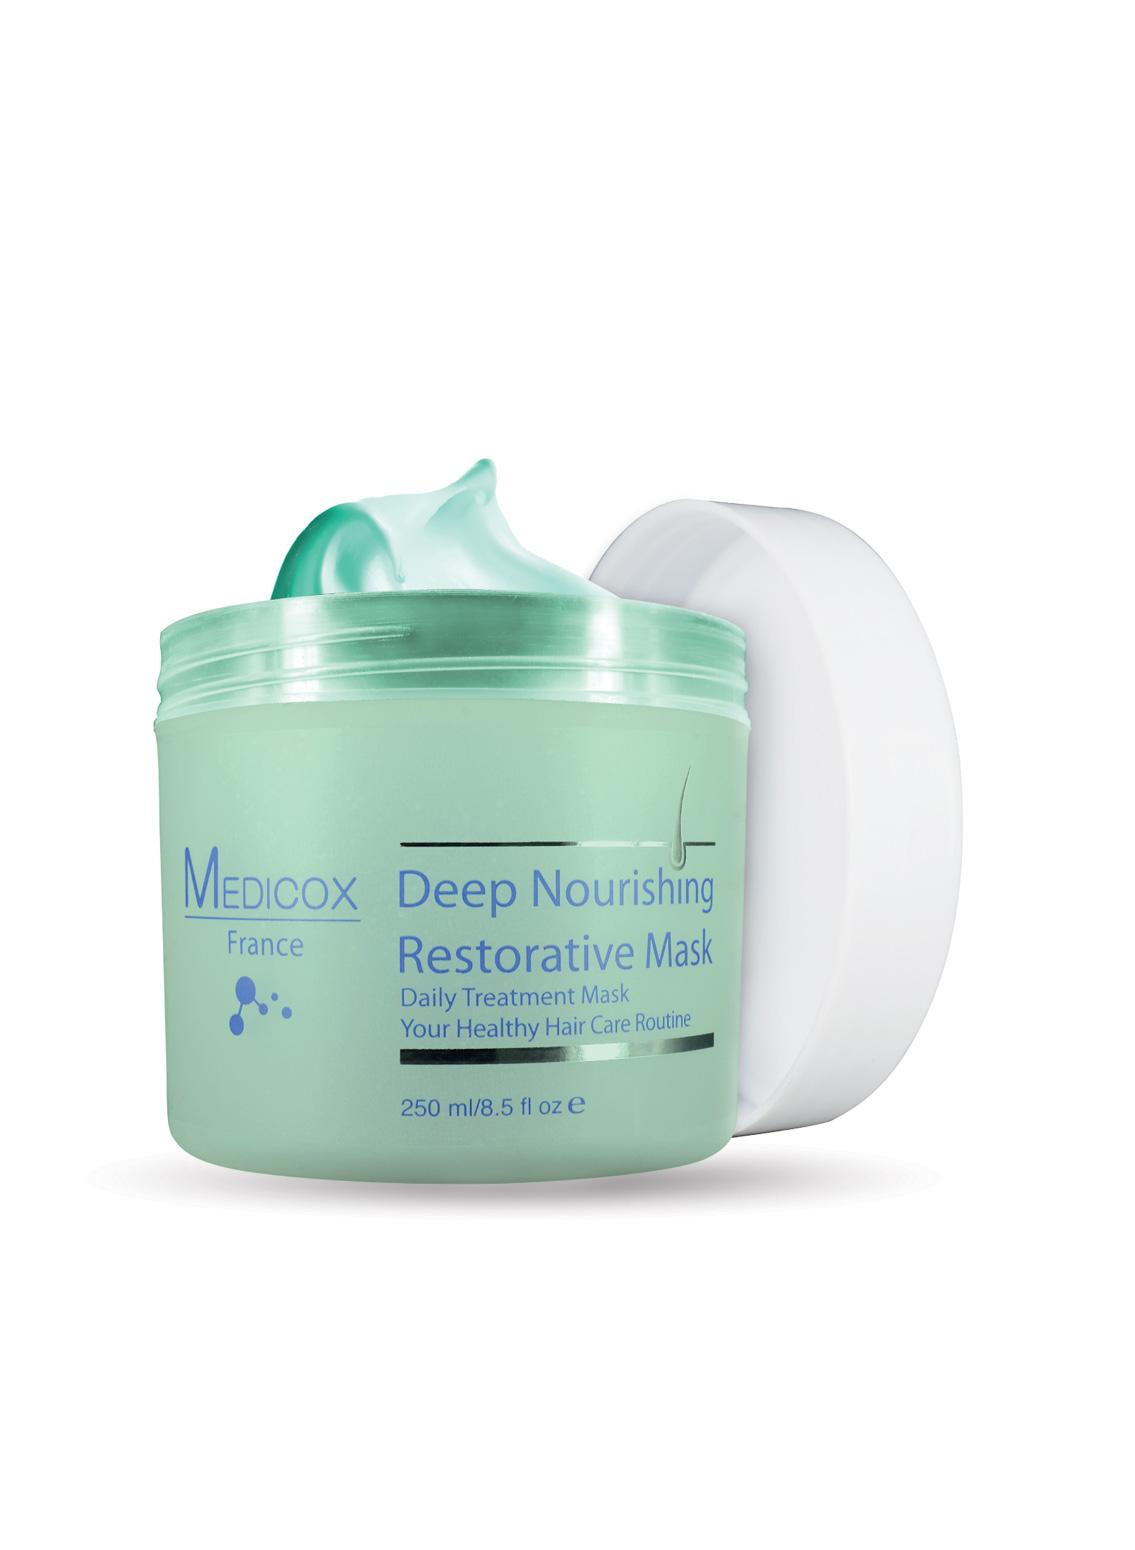 Deep Nourishing Restorative Mask